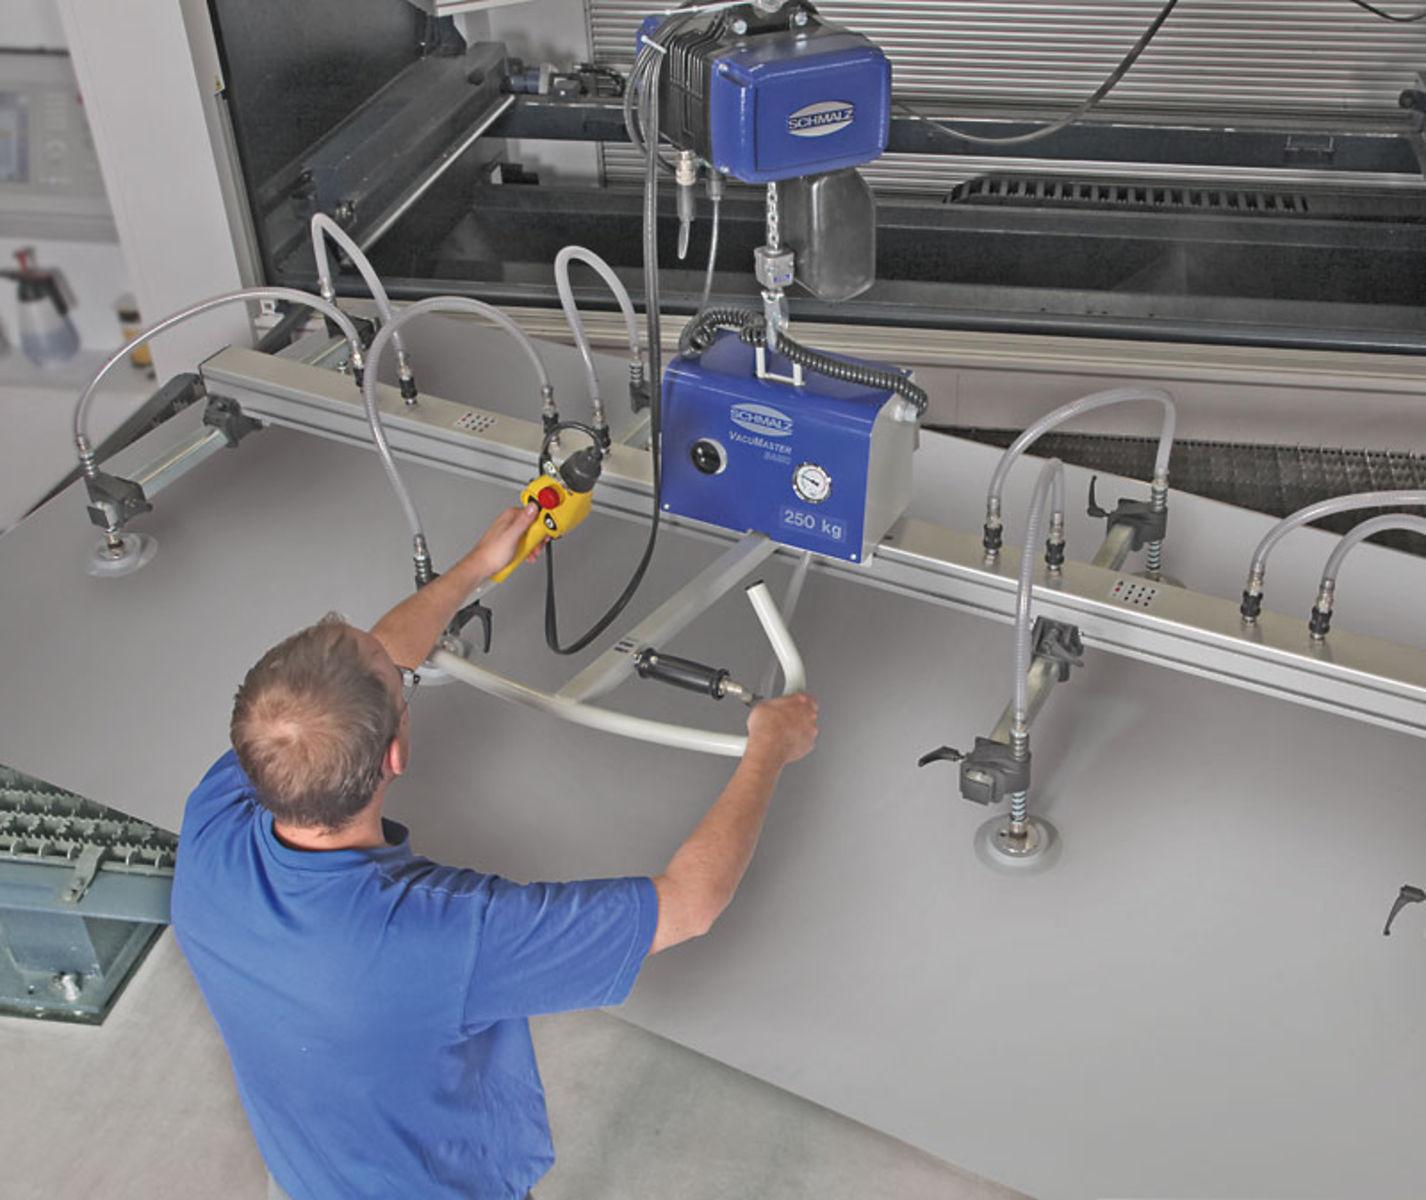 Panel Lifting Devices : Interlift vacuum lifter lifting equipment schmalz